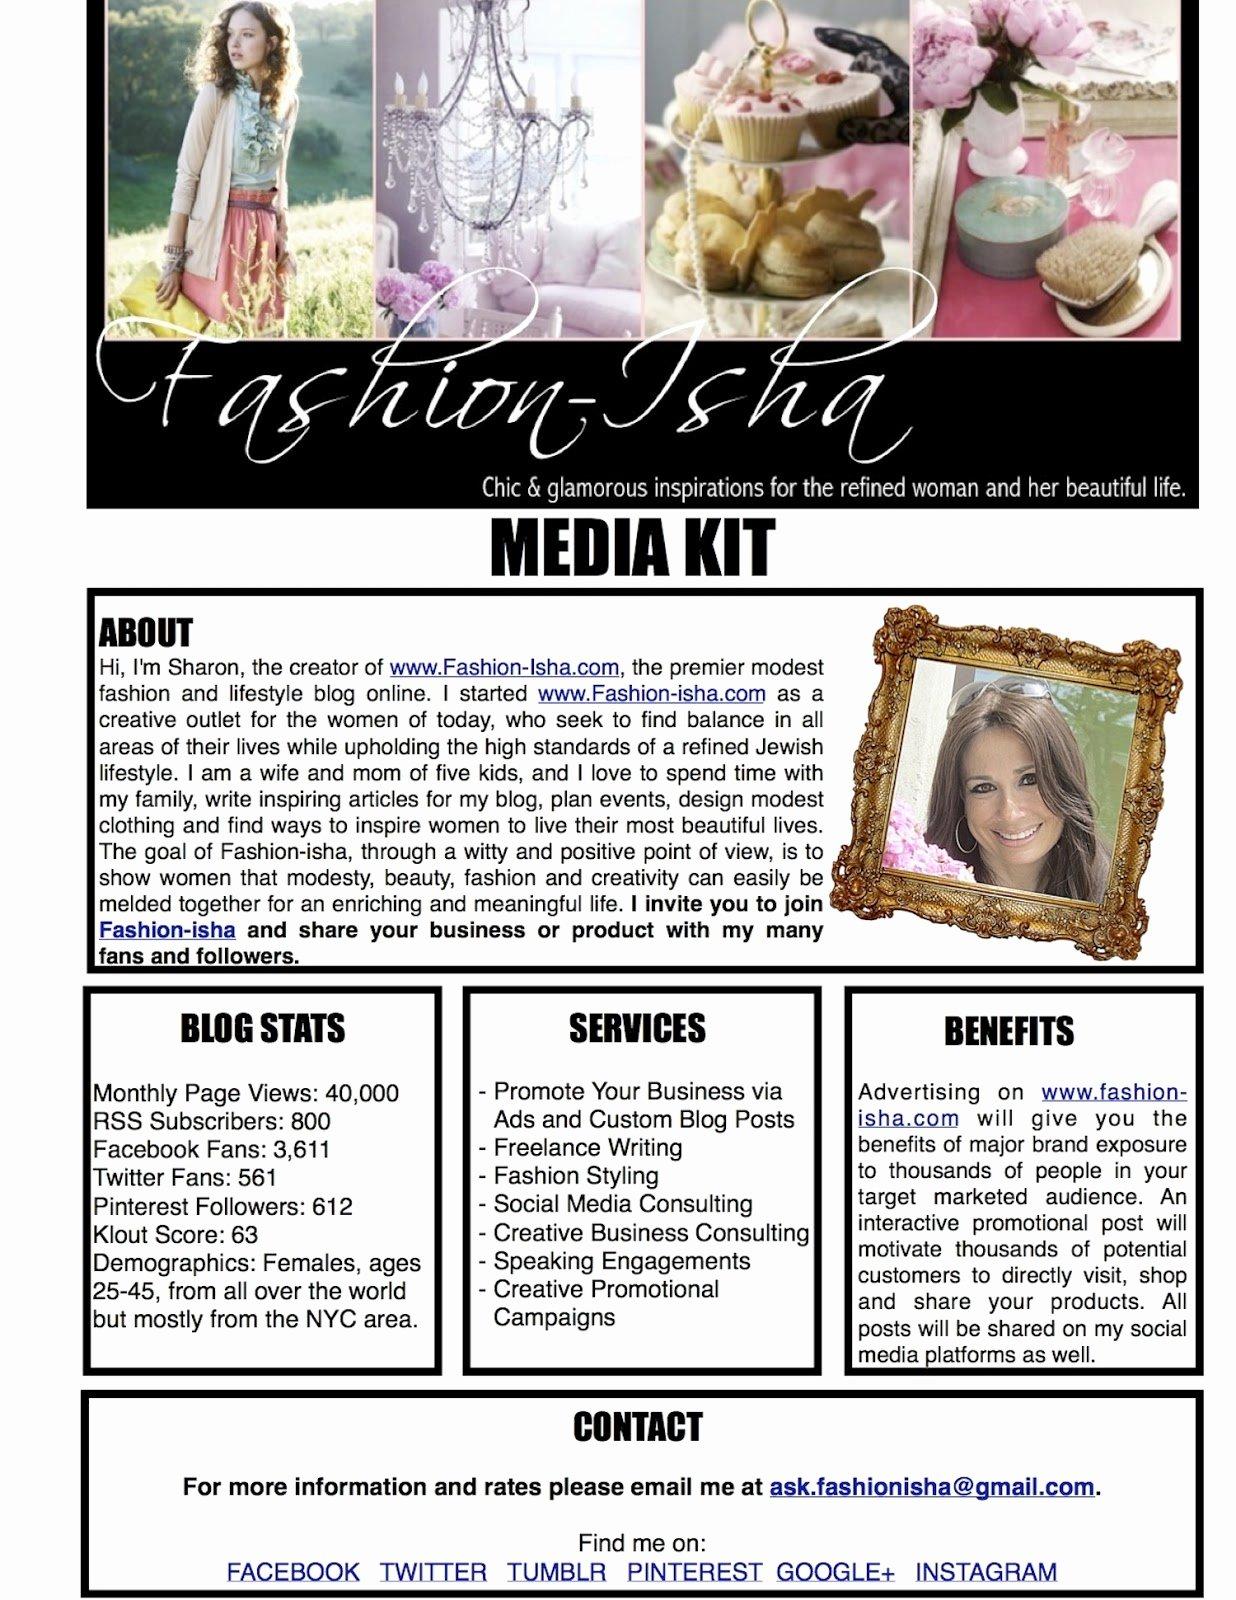 Press Kit Template Word Fresh Media Kit Template